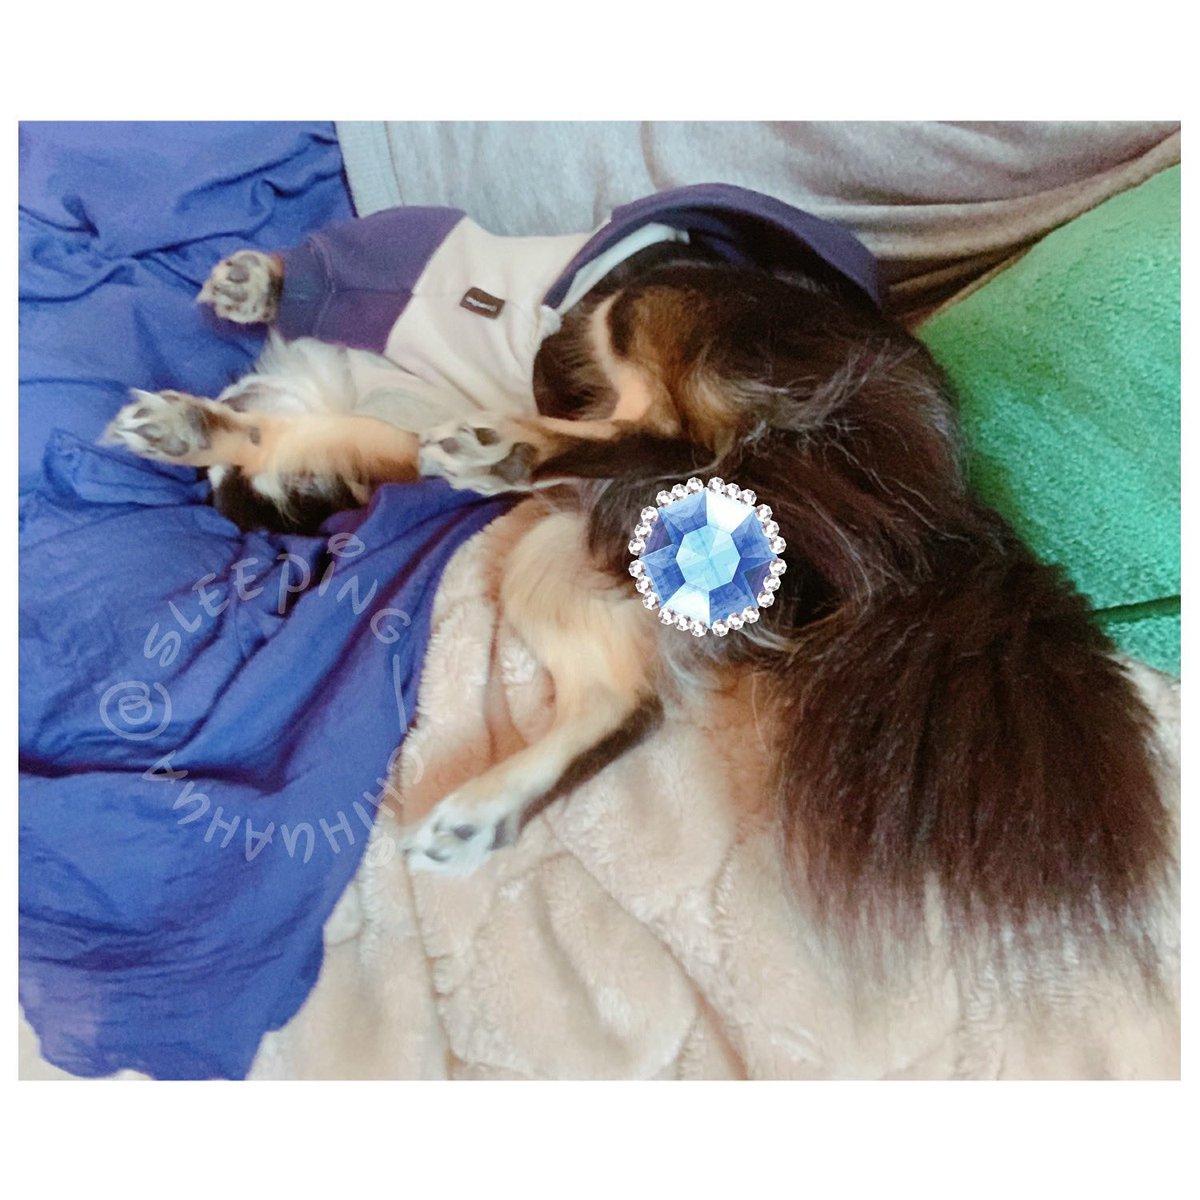 #sleeping #chihuahua #sleepingchihuahua #チワワ #寝相 #寝姿 #基本仰向け #笑える寝相 #無理矢理ではありません #のり巻きくんの寝姿  まだまだ密やかに #stayhome 継続中。 https://t.co/jeYZL9x5M6